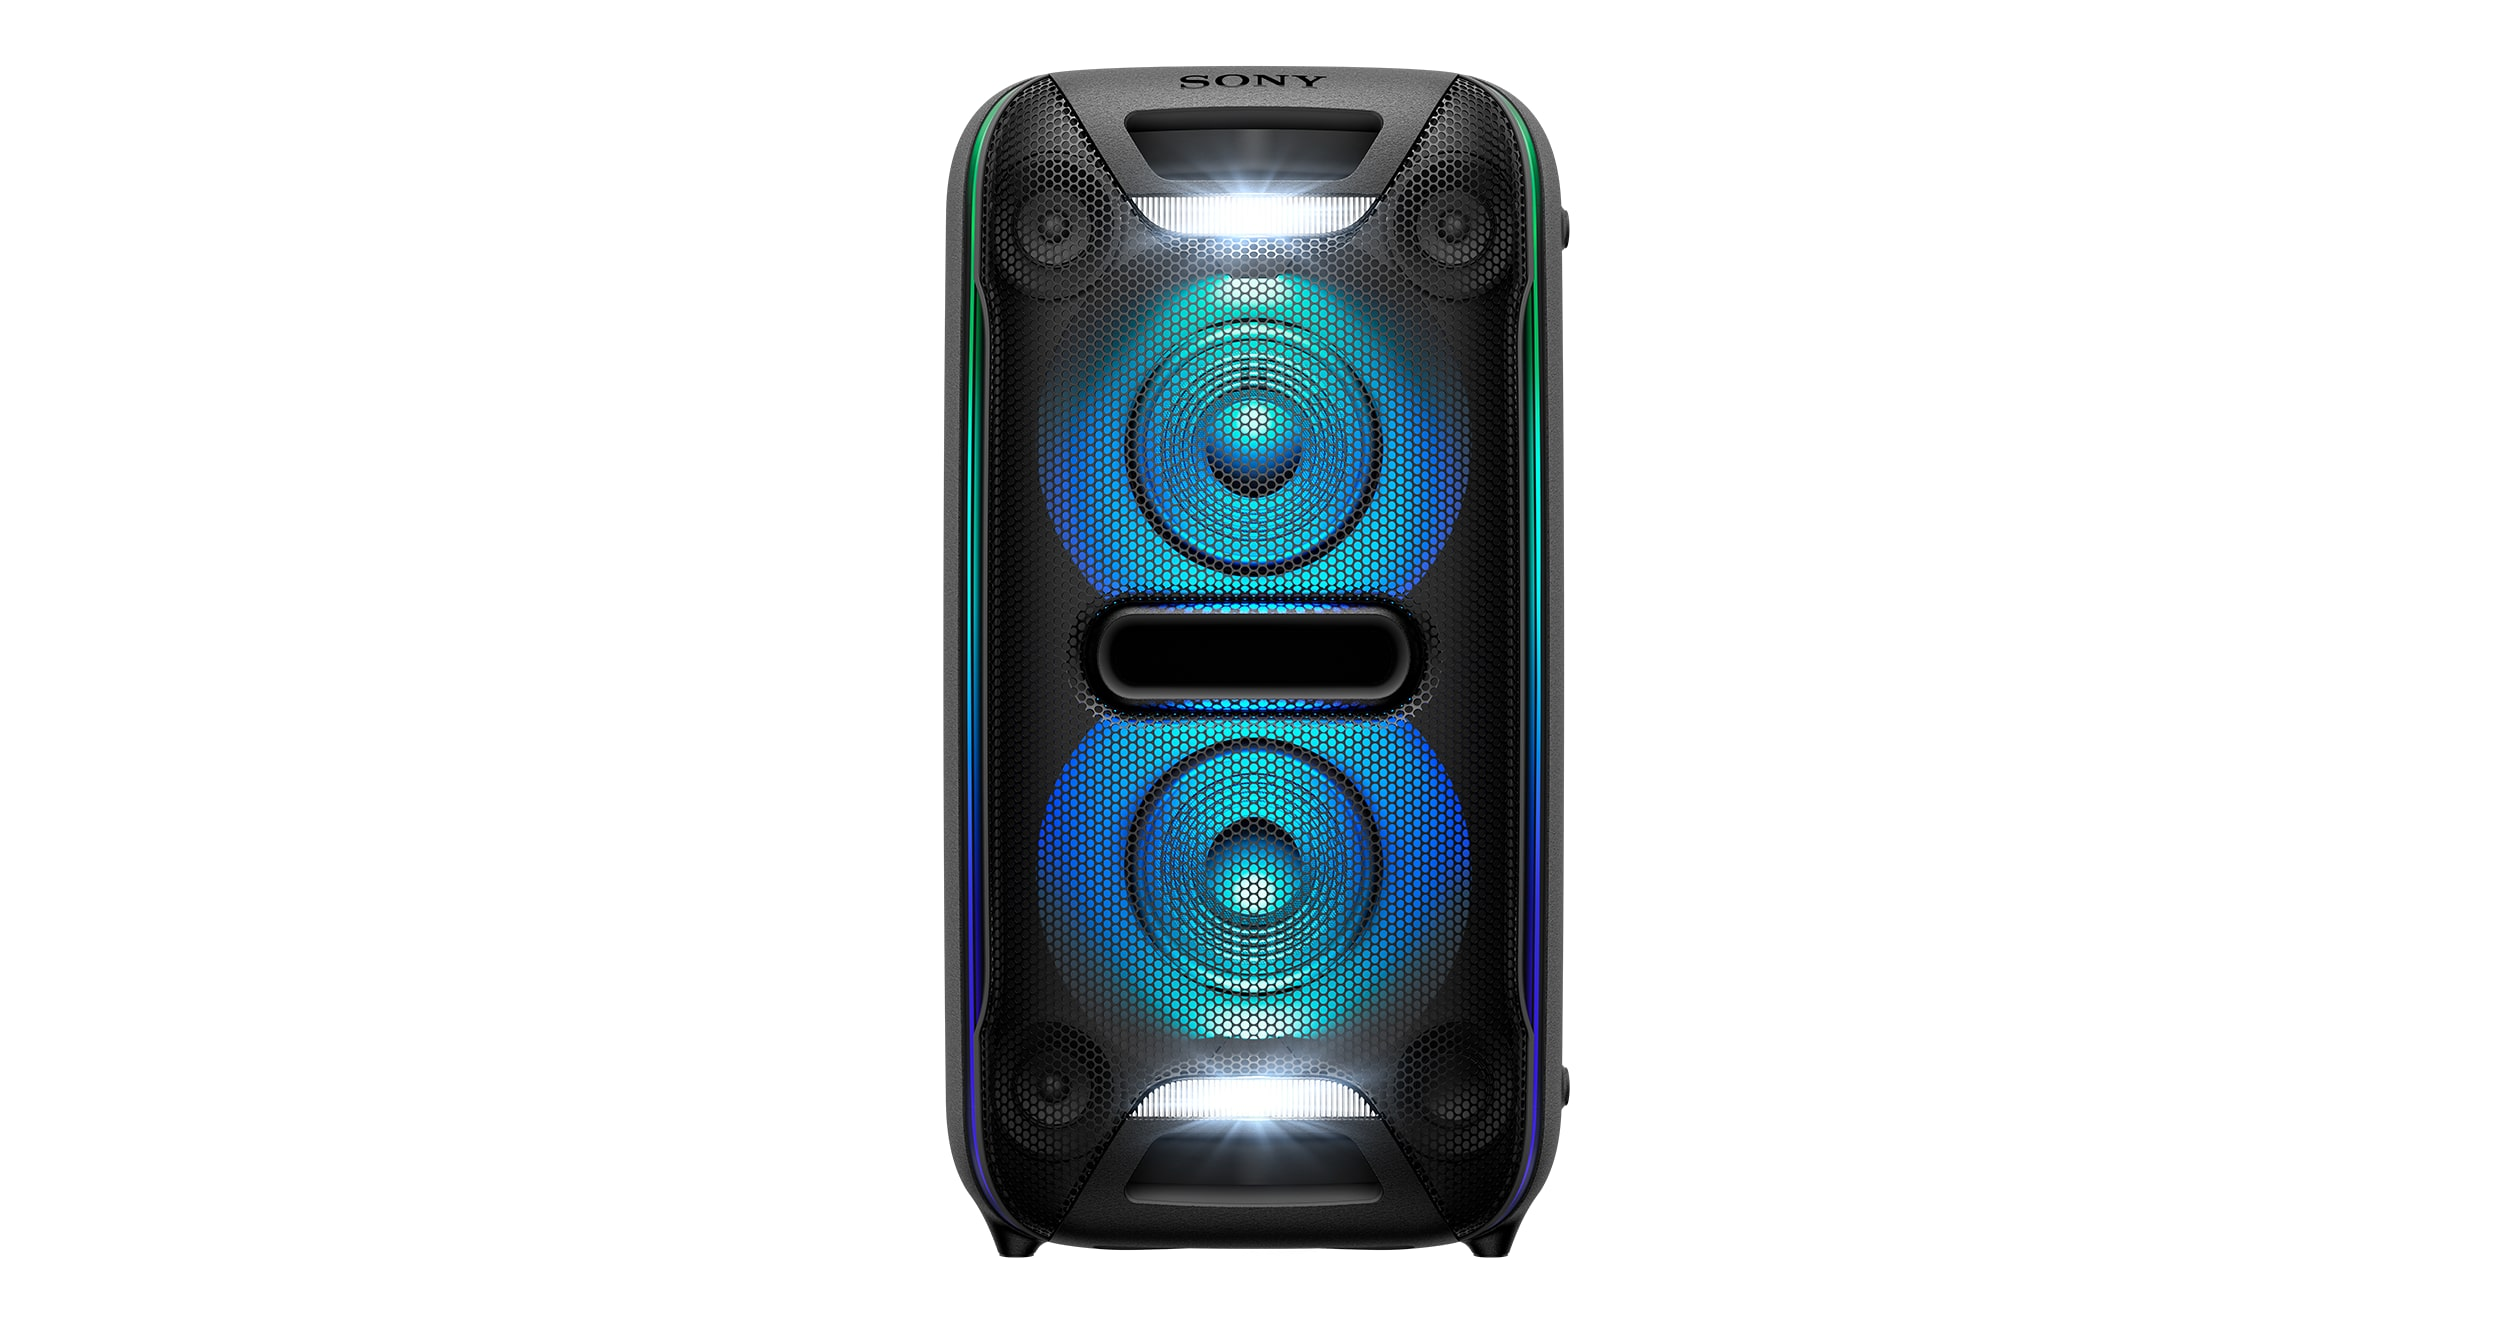 Xb72 Extra Bass High Power Audio System Gtk Xb72 Sony Uk